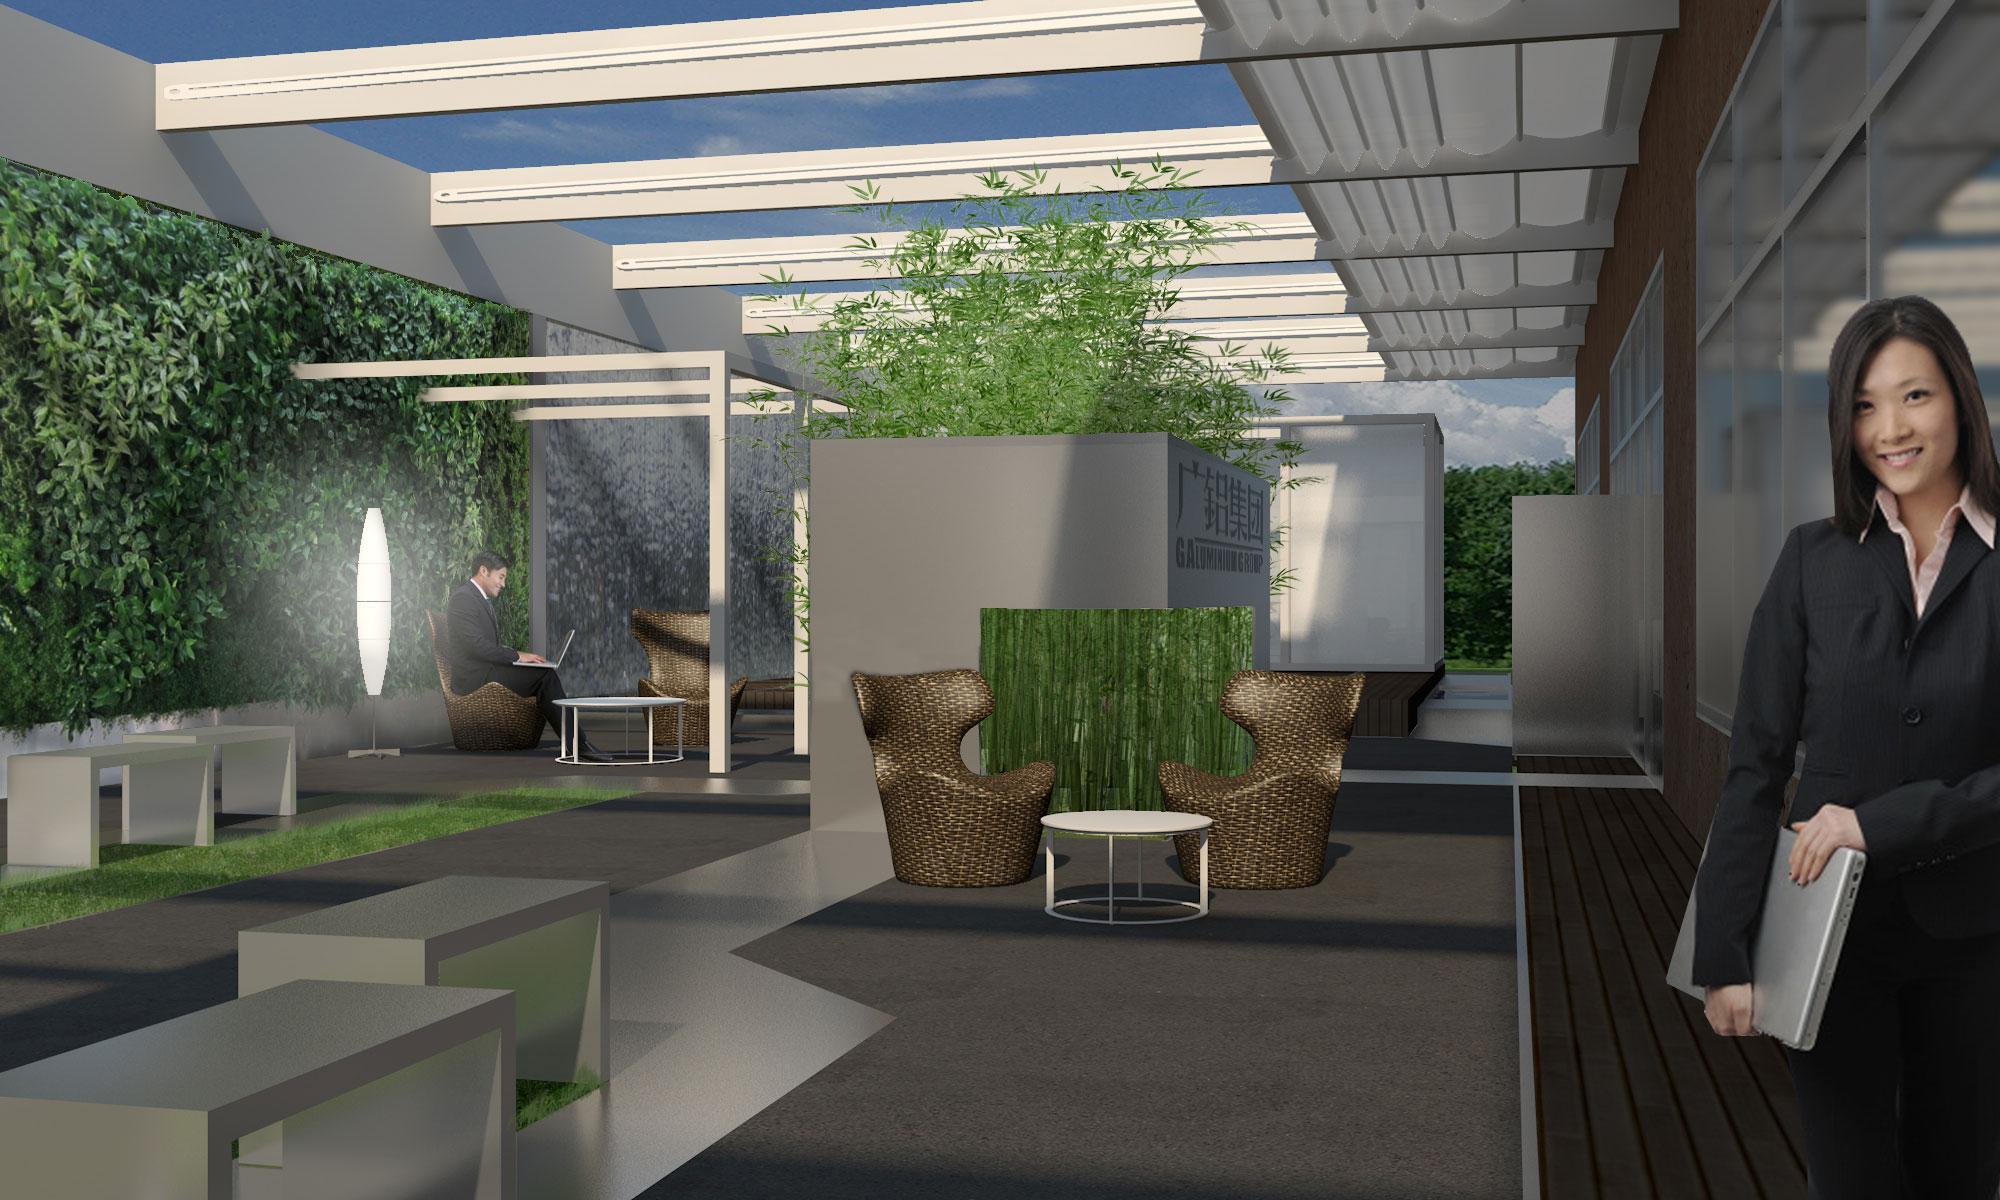 g aluminum showroom in guangzhou cn uainot. Black Bedroom Furniture Sets. Home Design Ideas